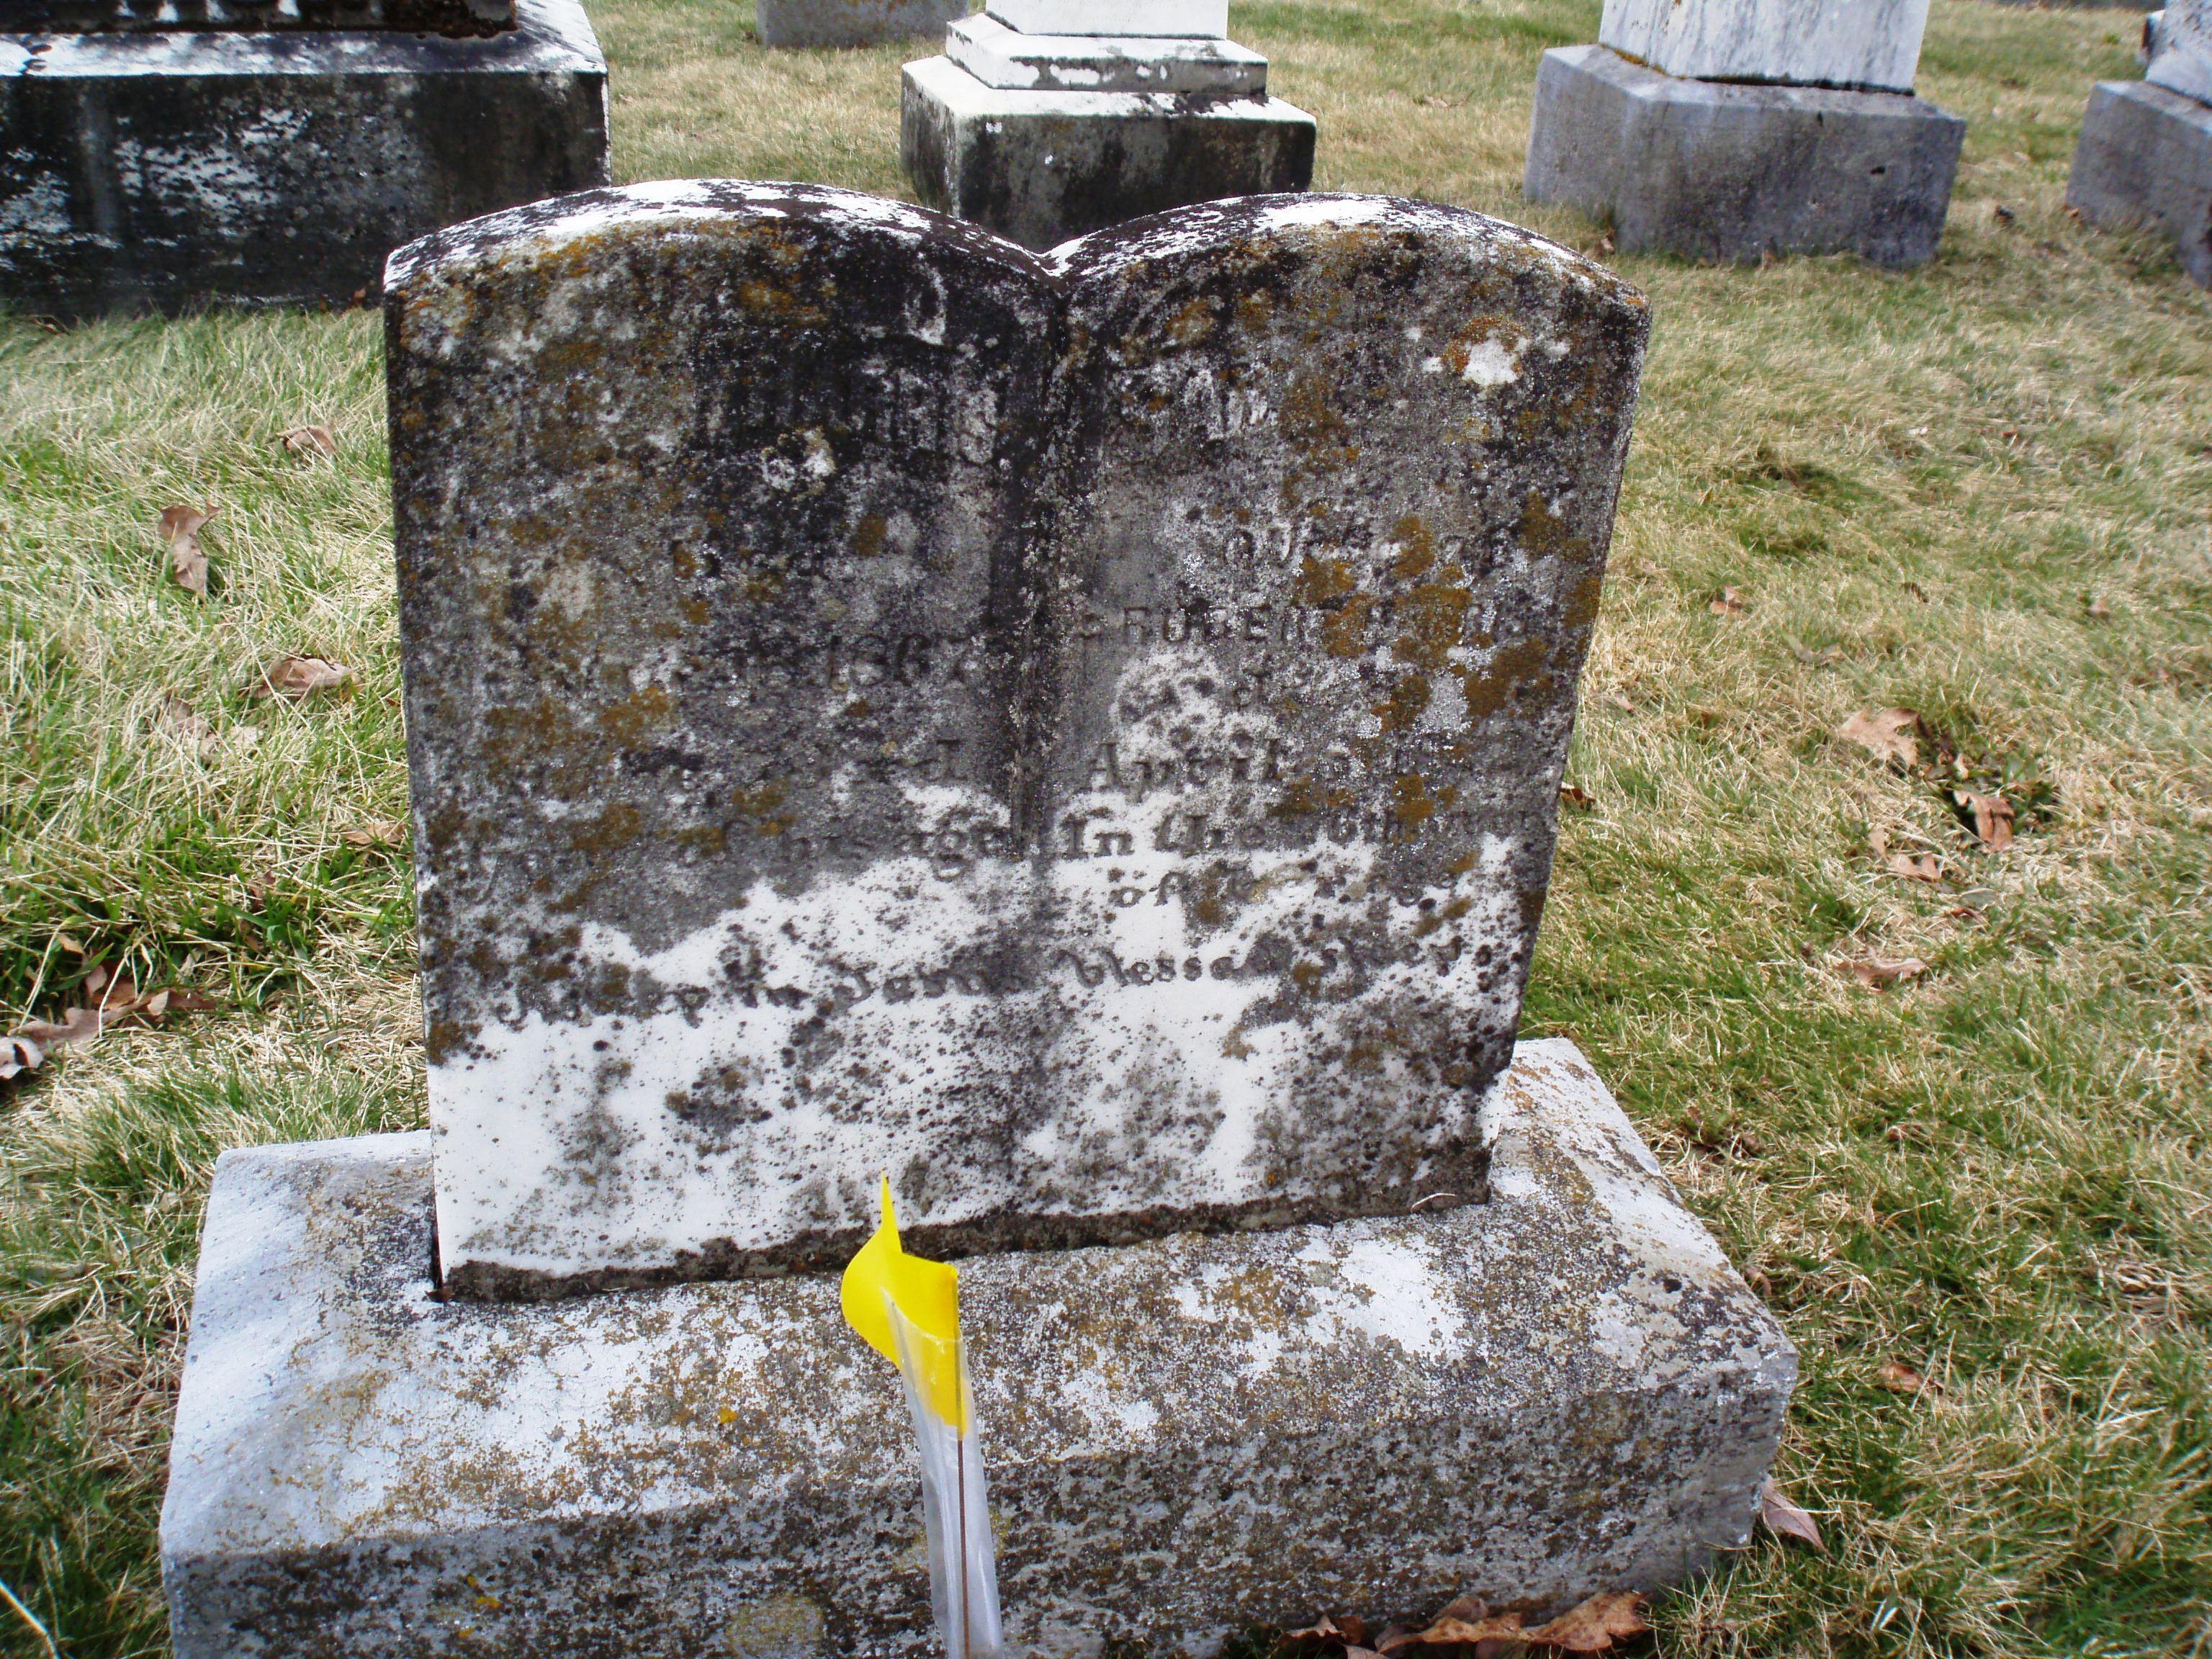 Gravestone of Robert Harris & spouse